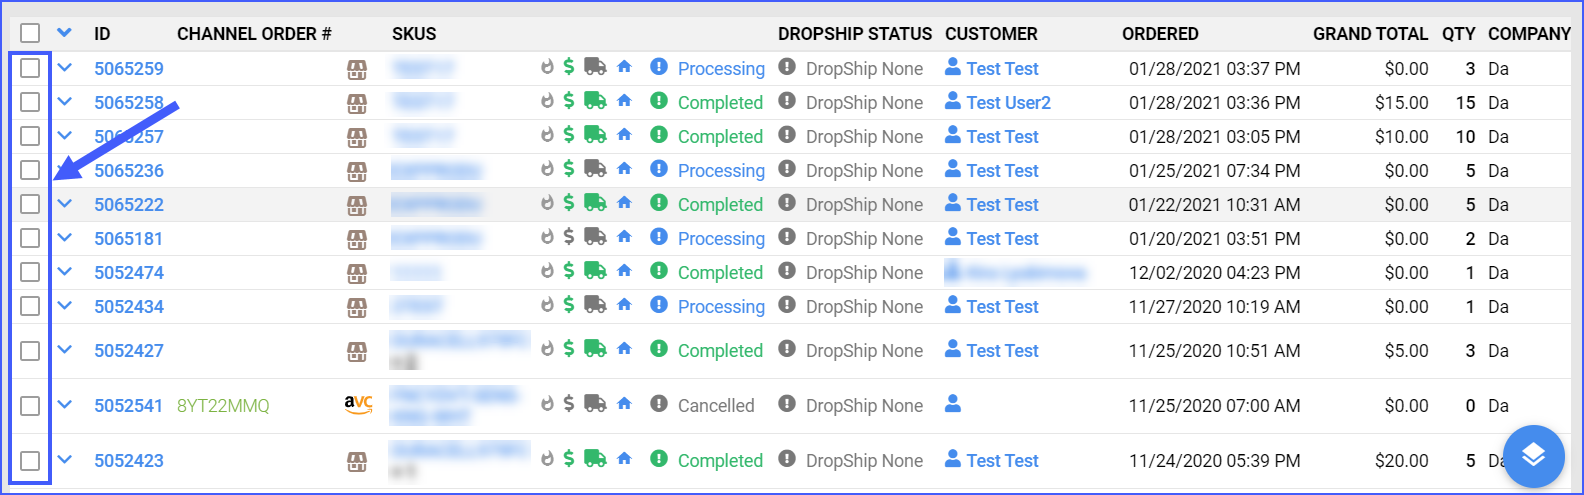 sellercloud delta interface search orders